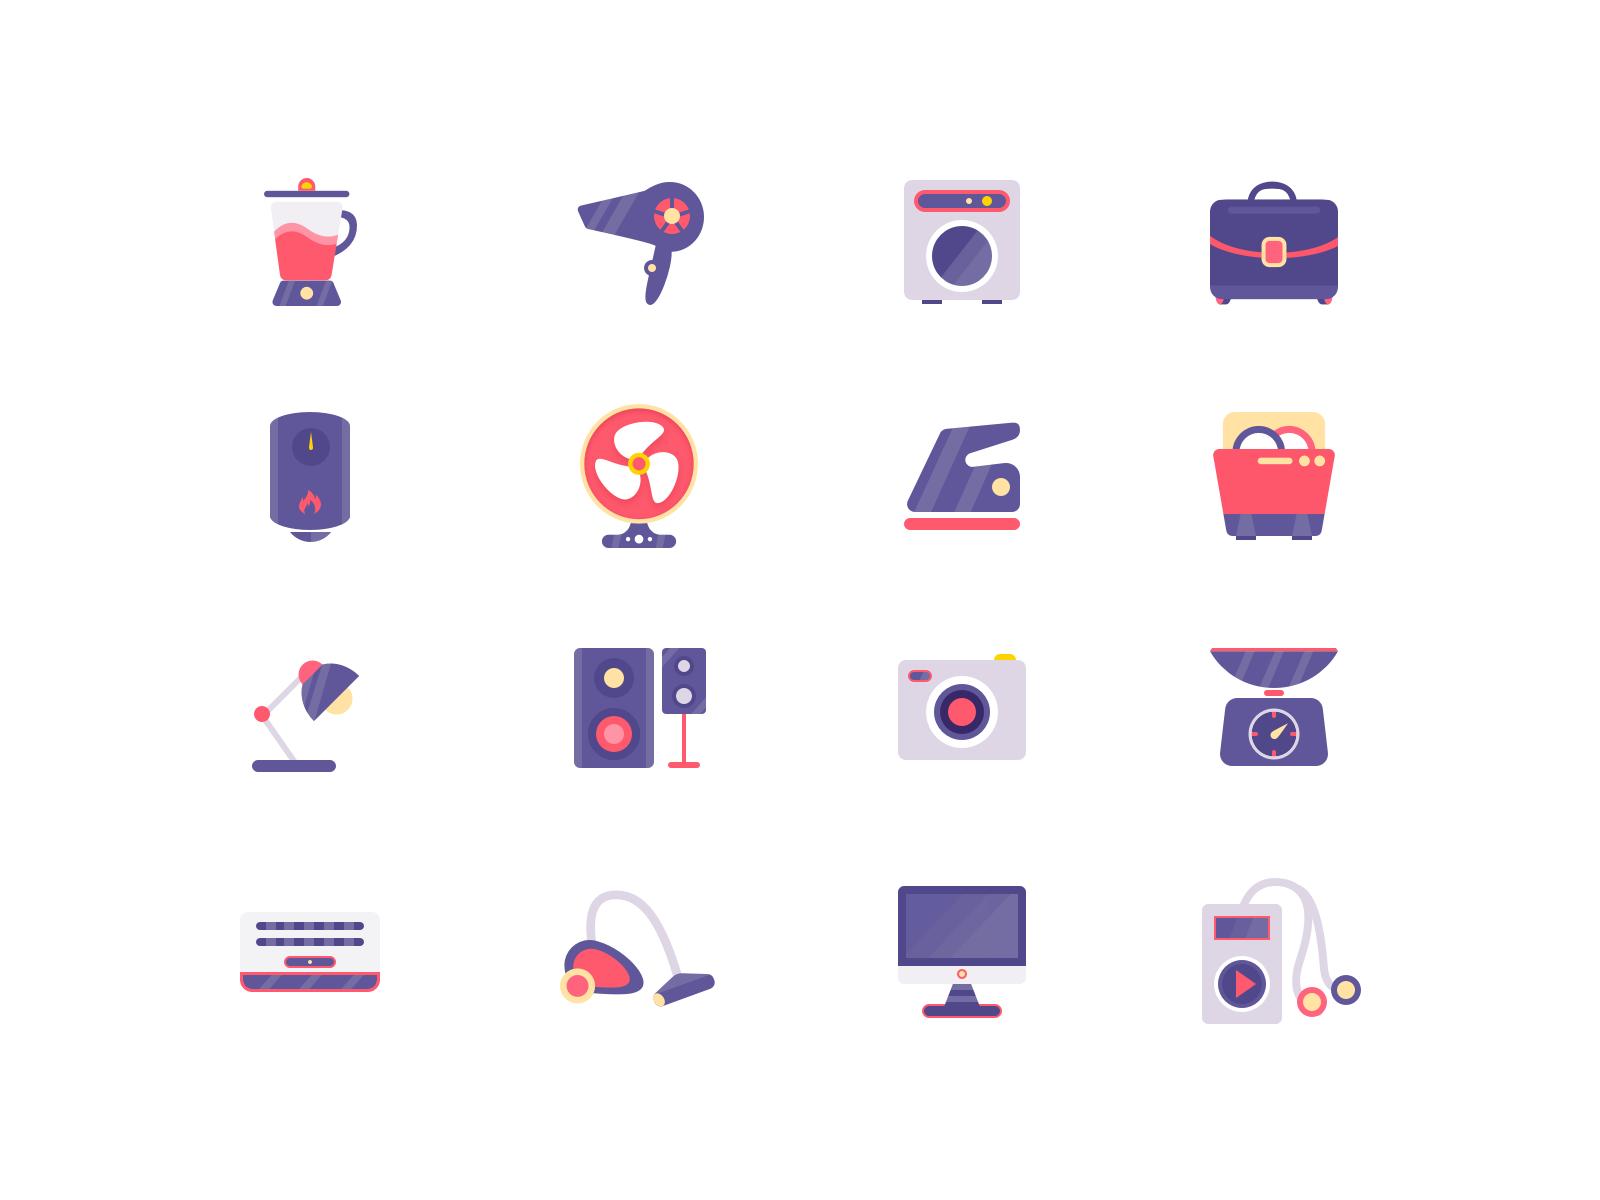 Icons appliances 2 2x